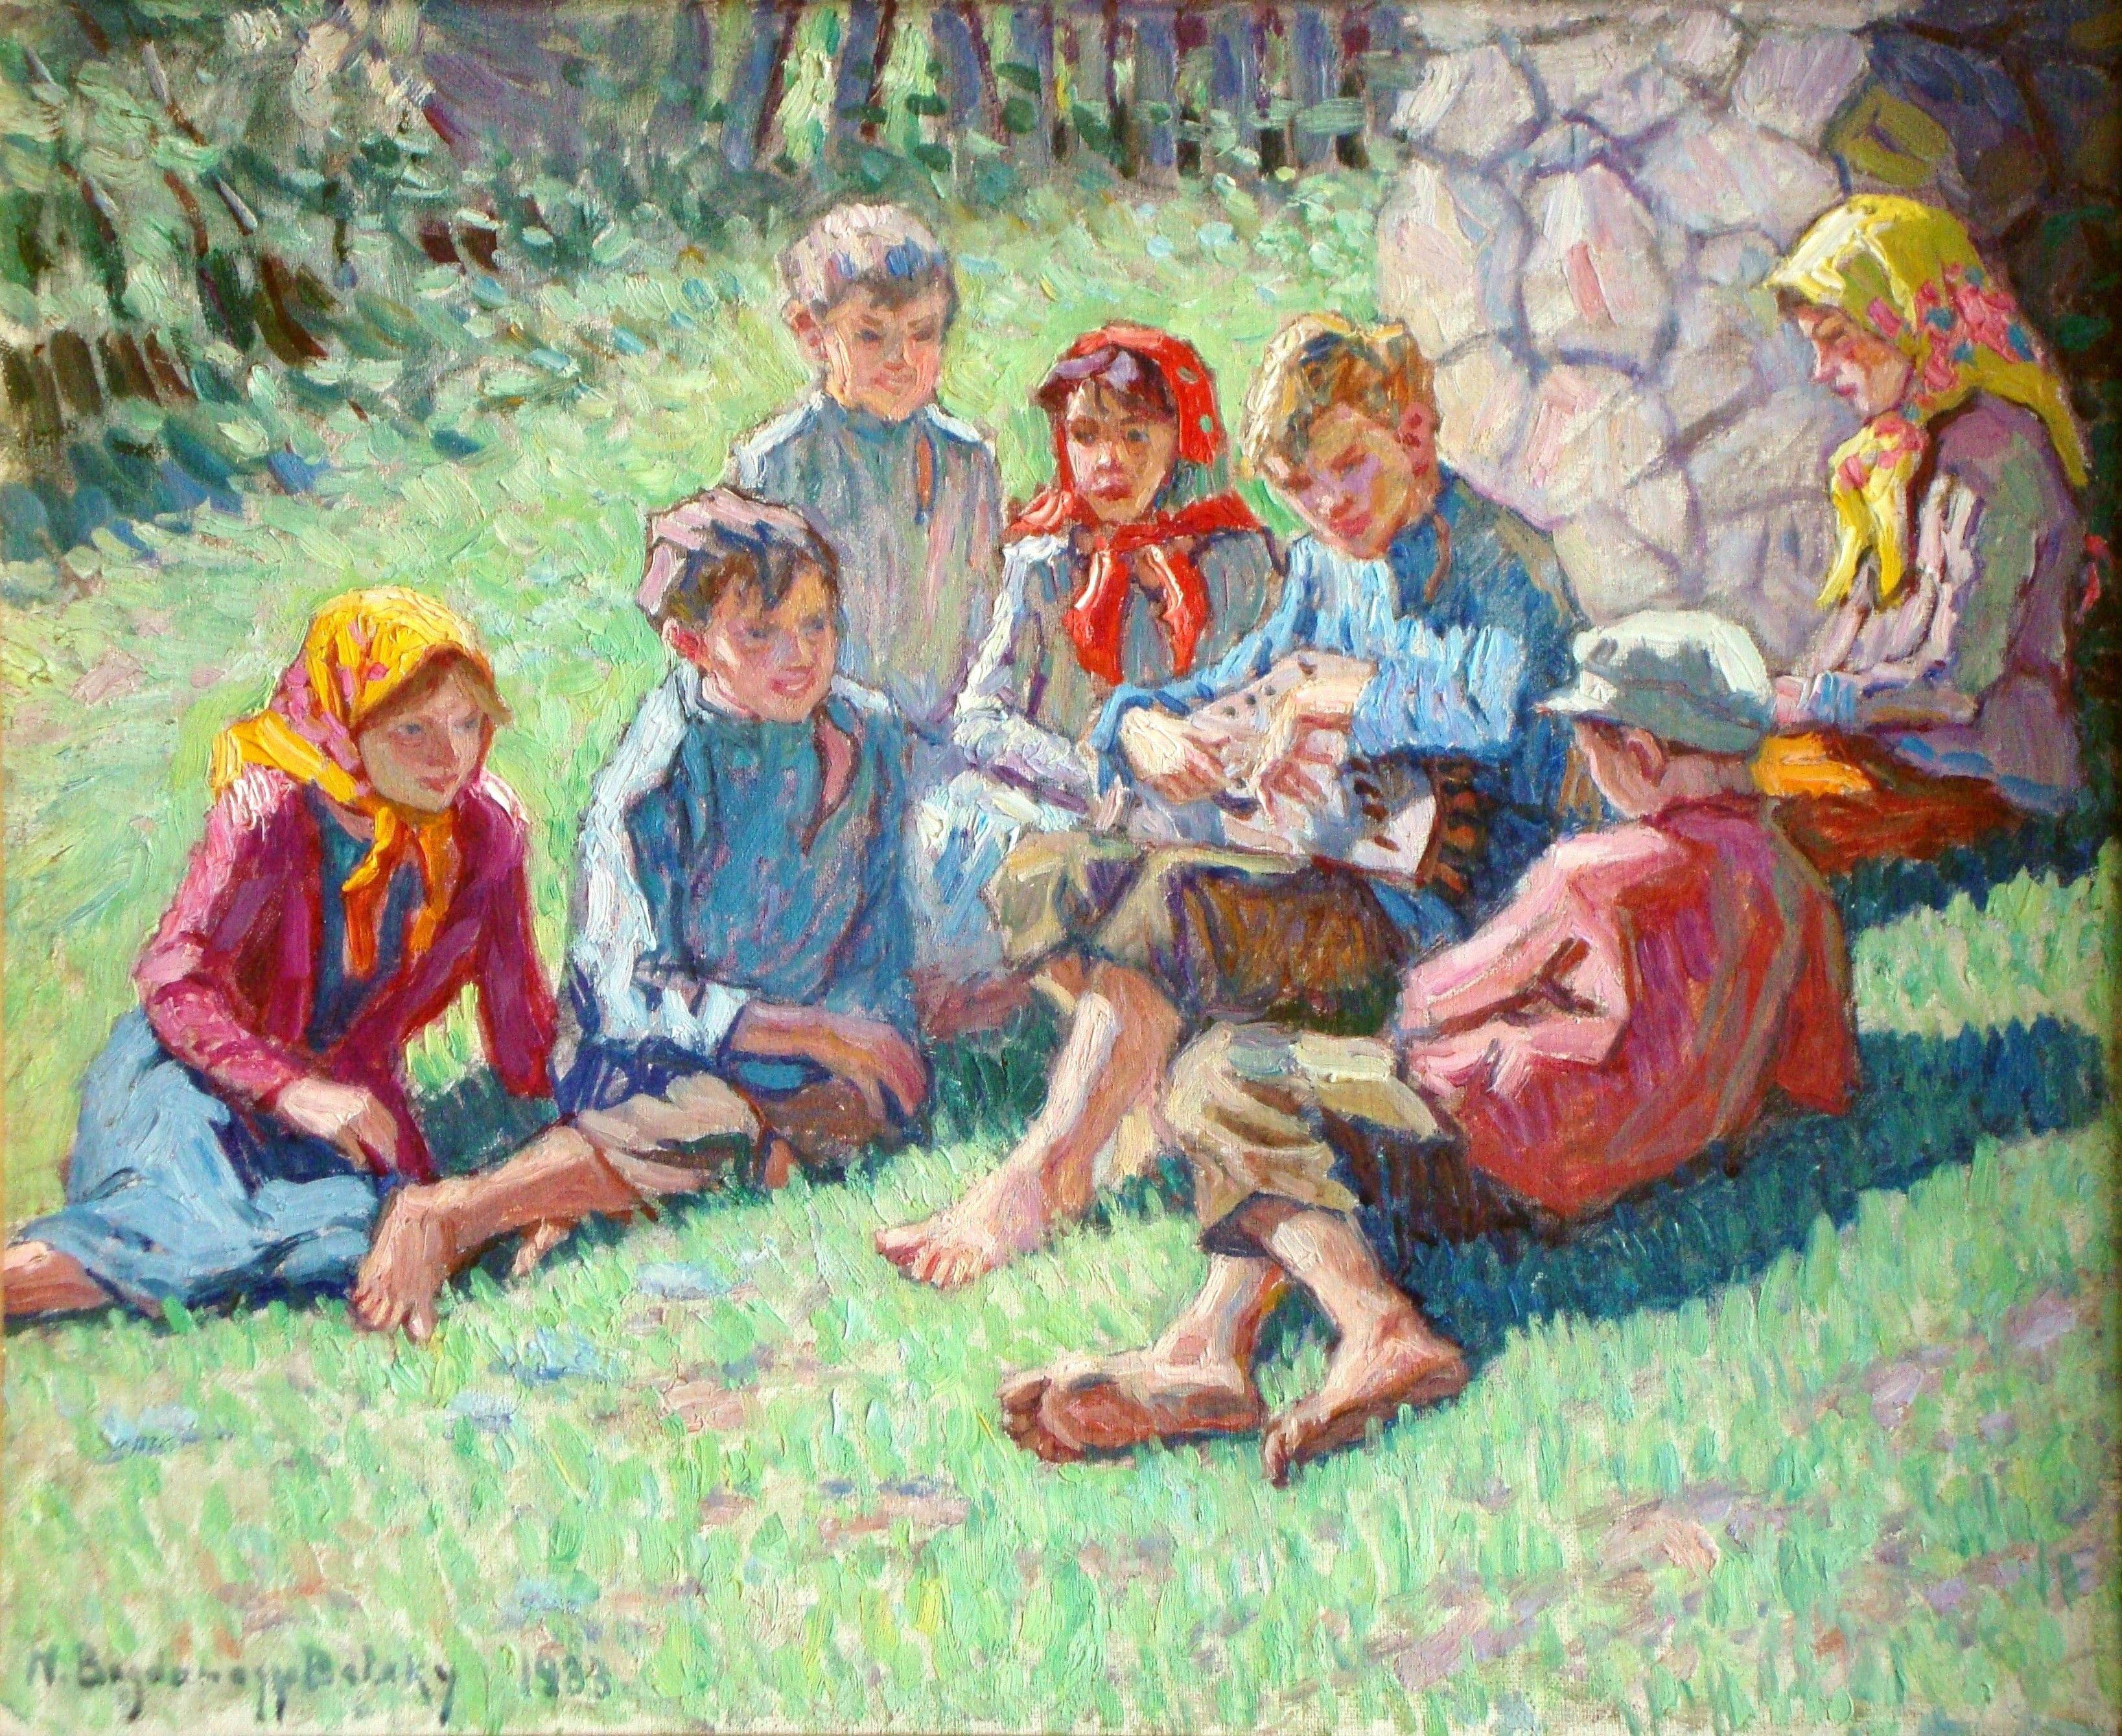 Children's celebration. 1933, cardboard, canvas, oil, 24x30 cm